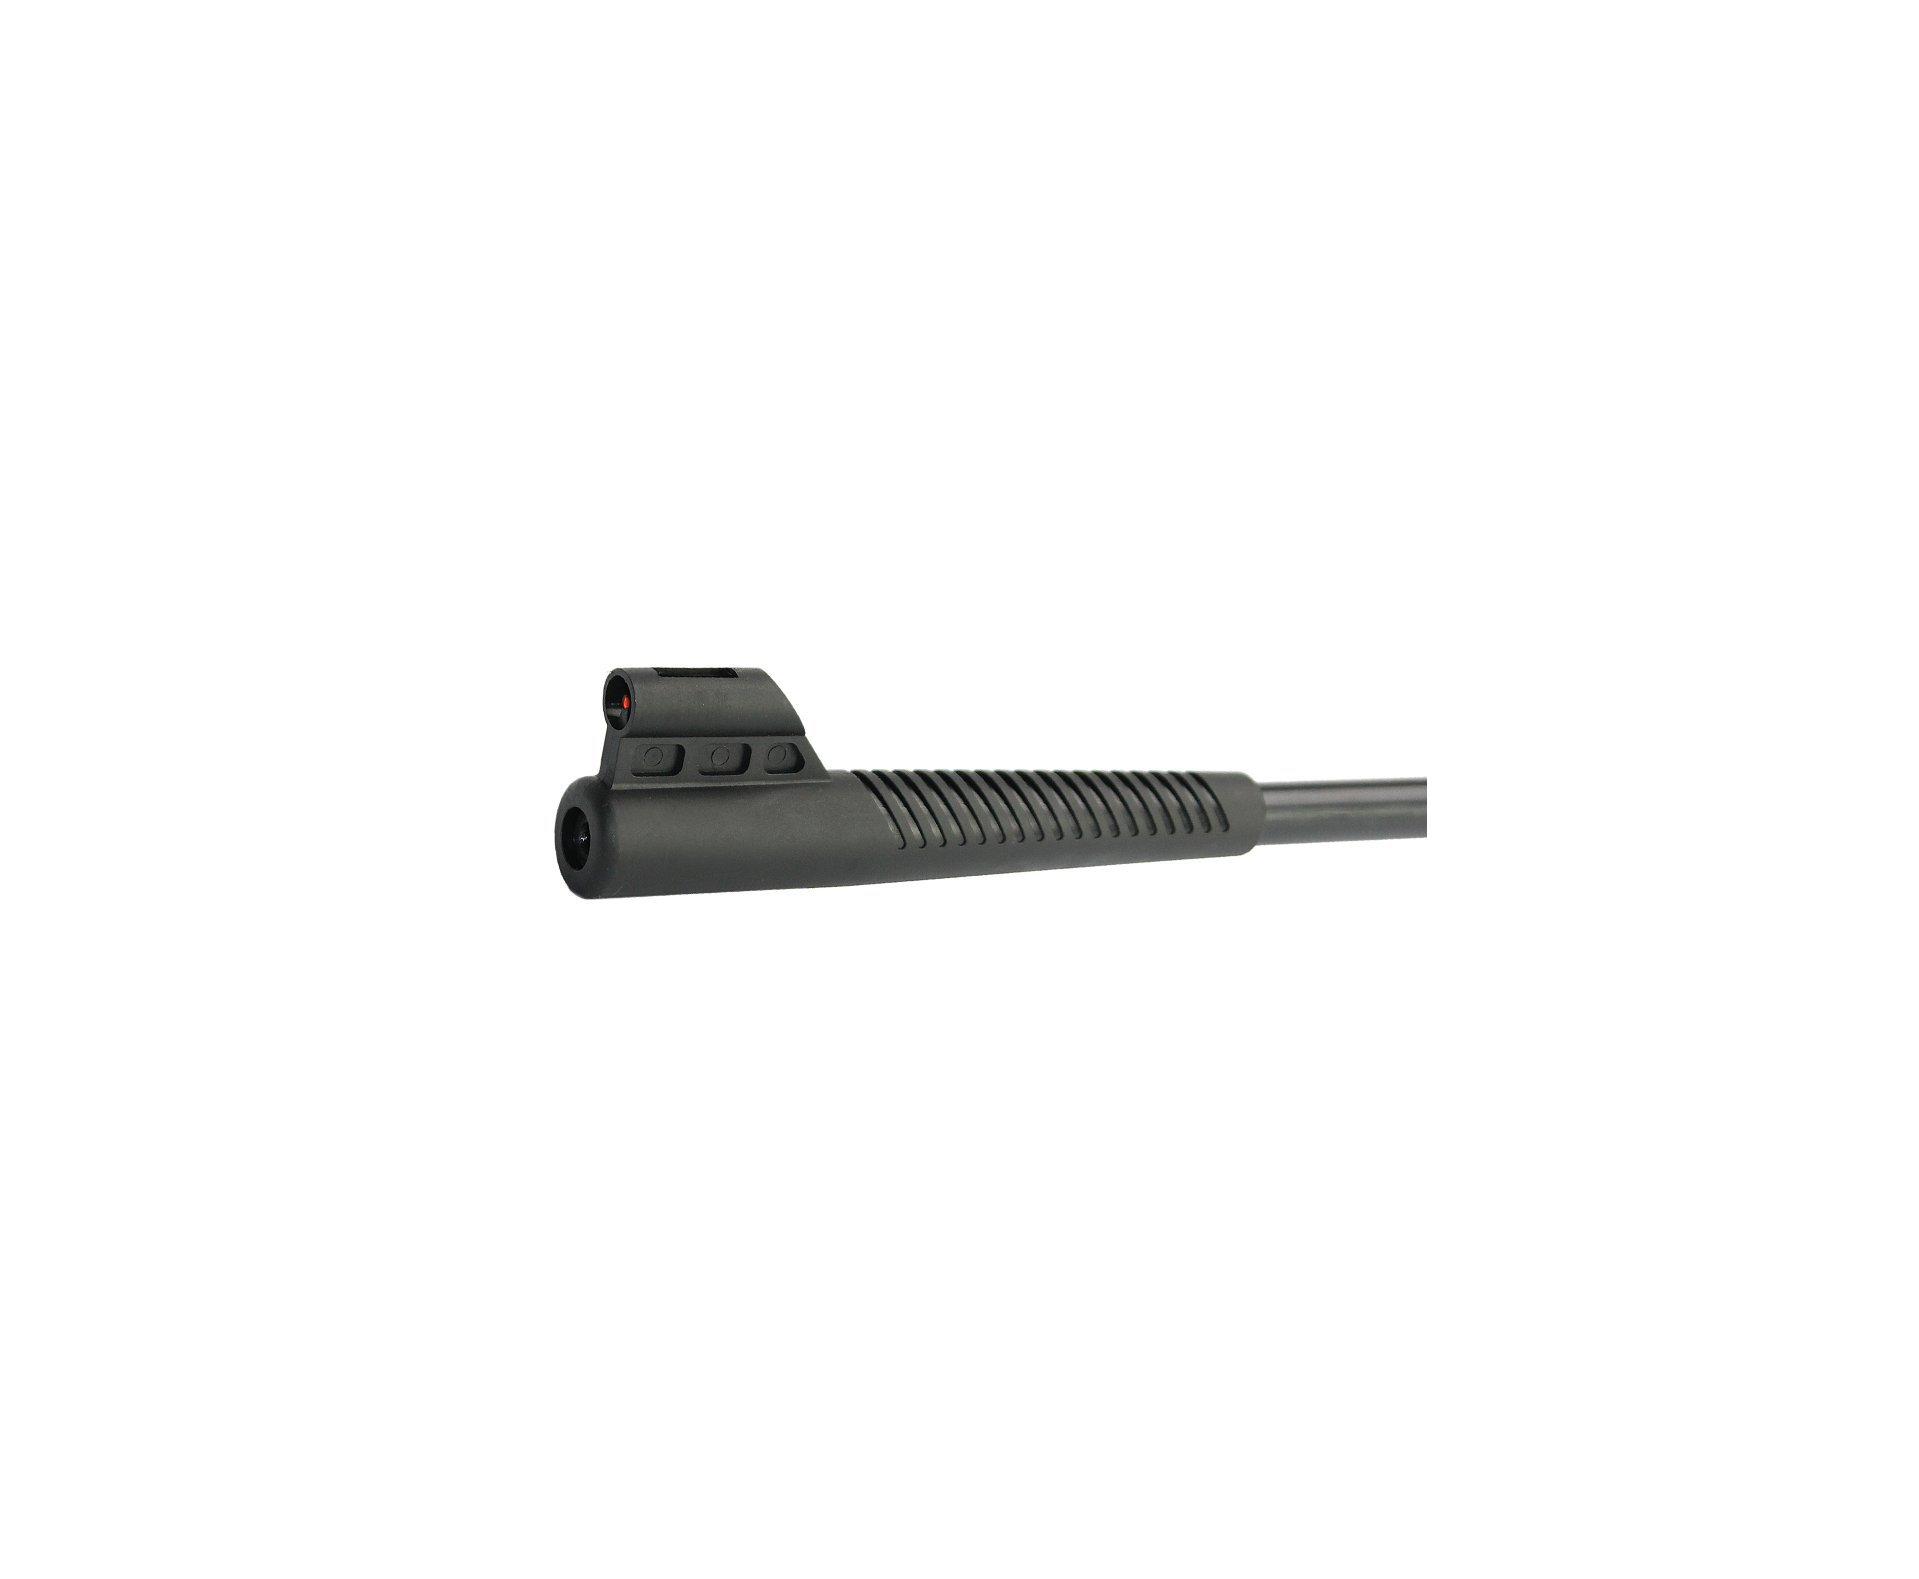 Carabina De Pressão Raptor Ii Gas Ram 70kg Madeira 5,5mm Qgk By Spa